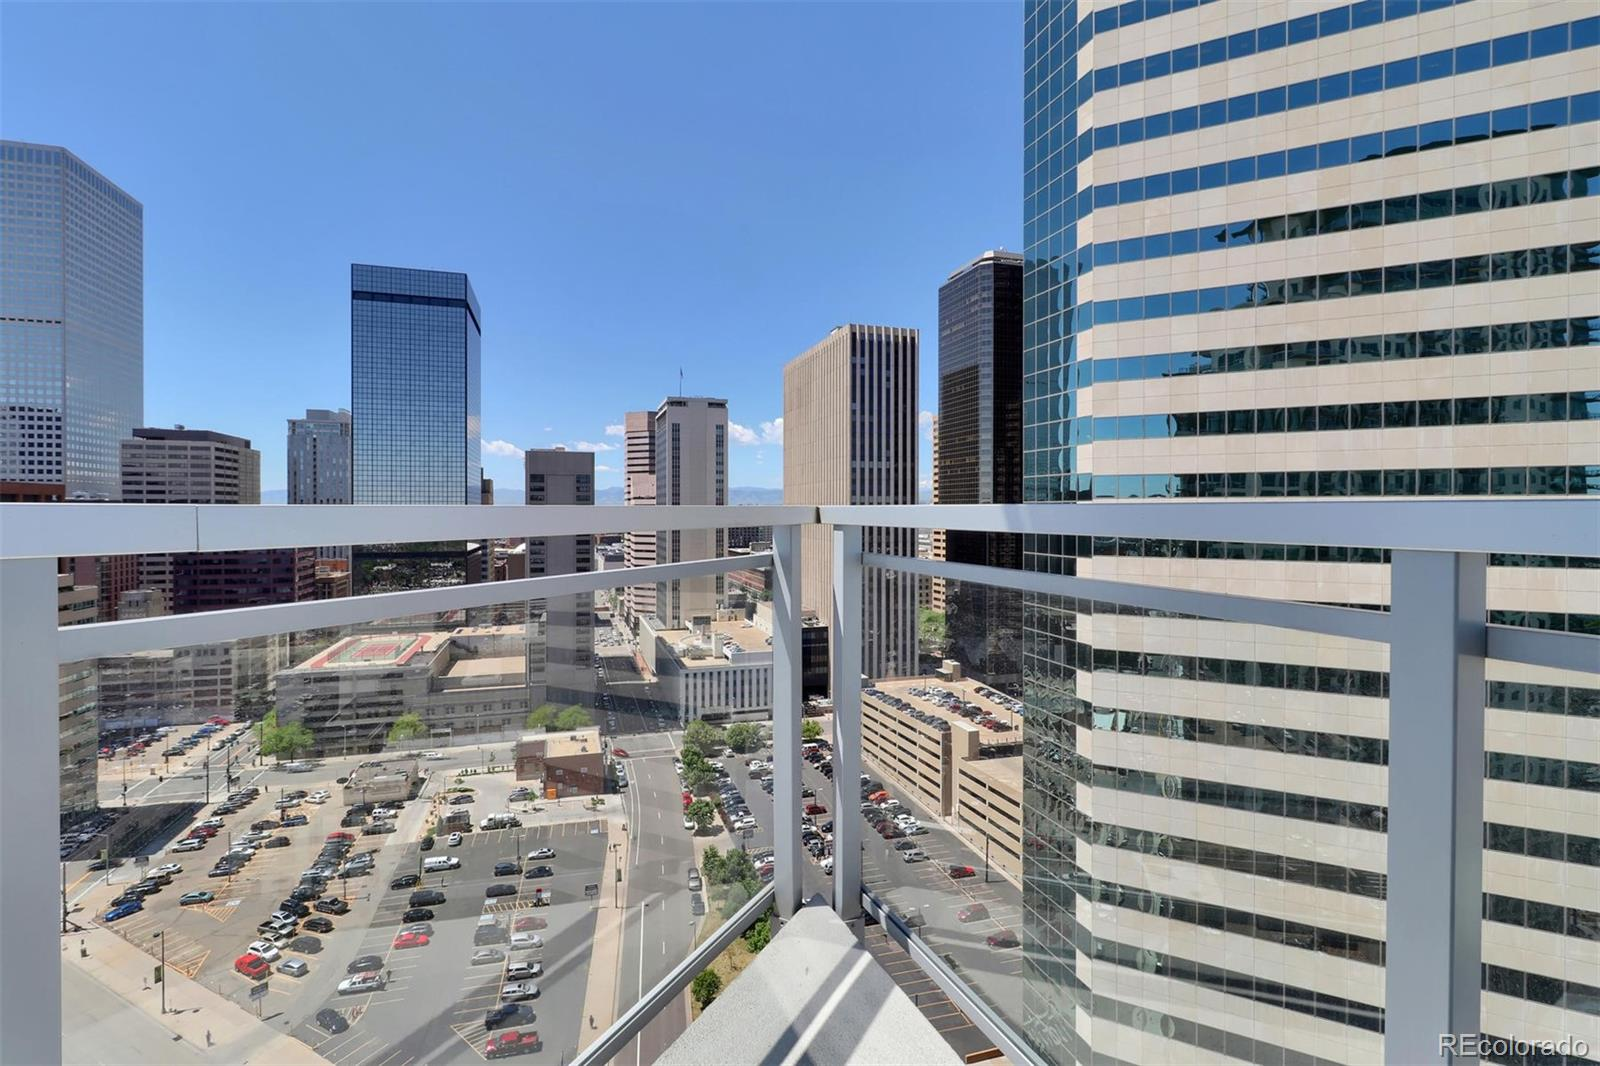 MLS# 7793144 - 26 - 2001 Lincoln Street #2011-L, Denver, CO 80202